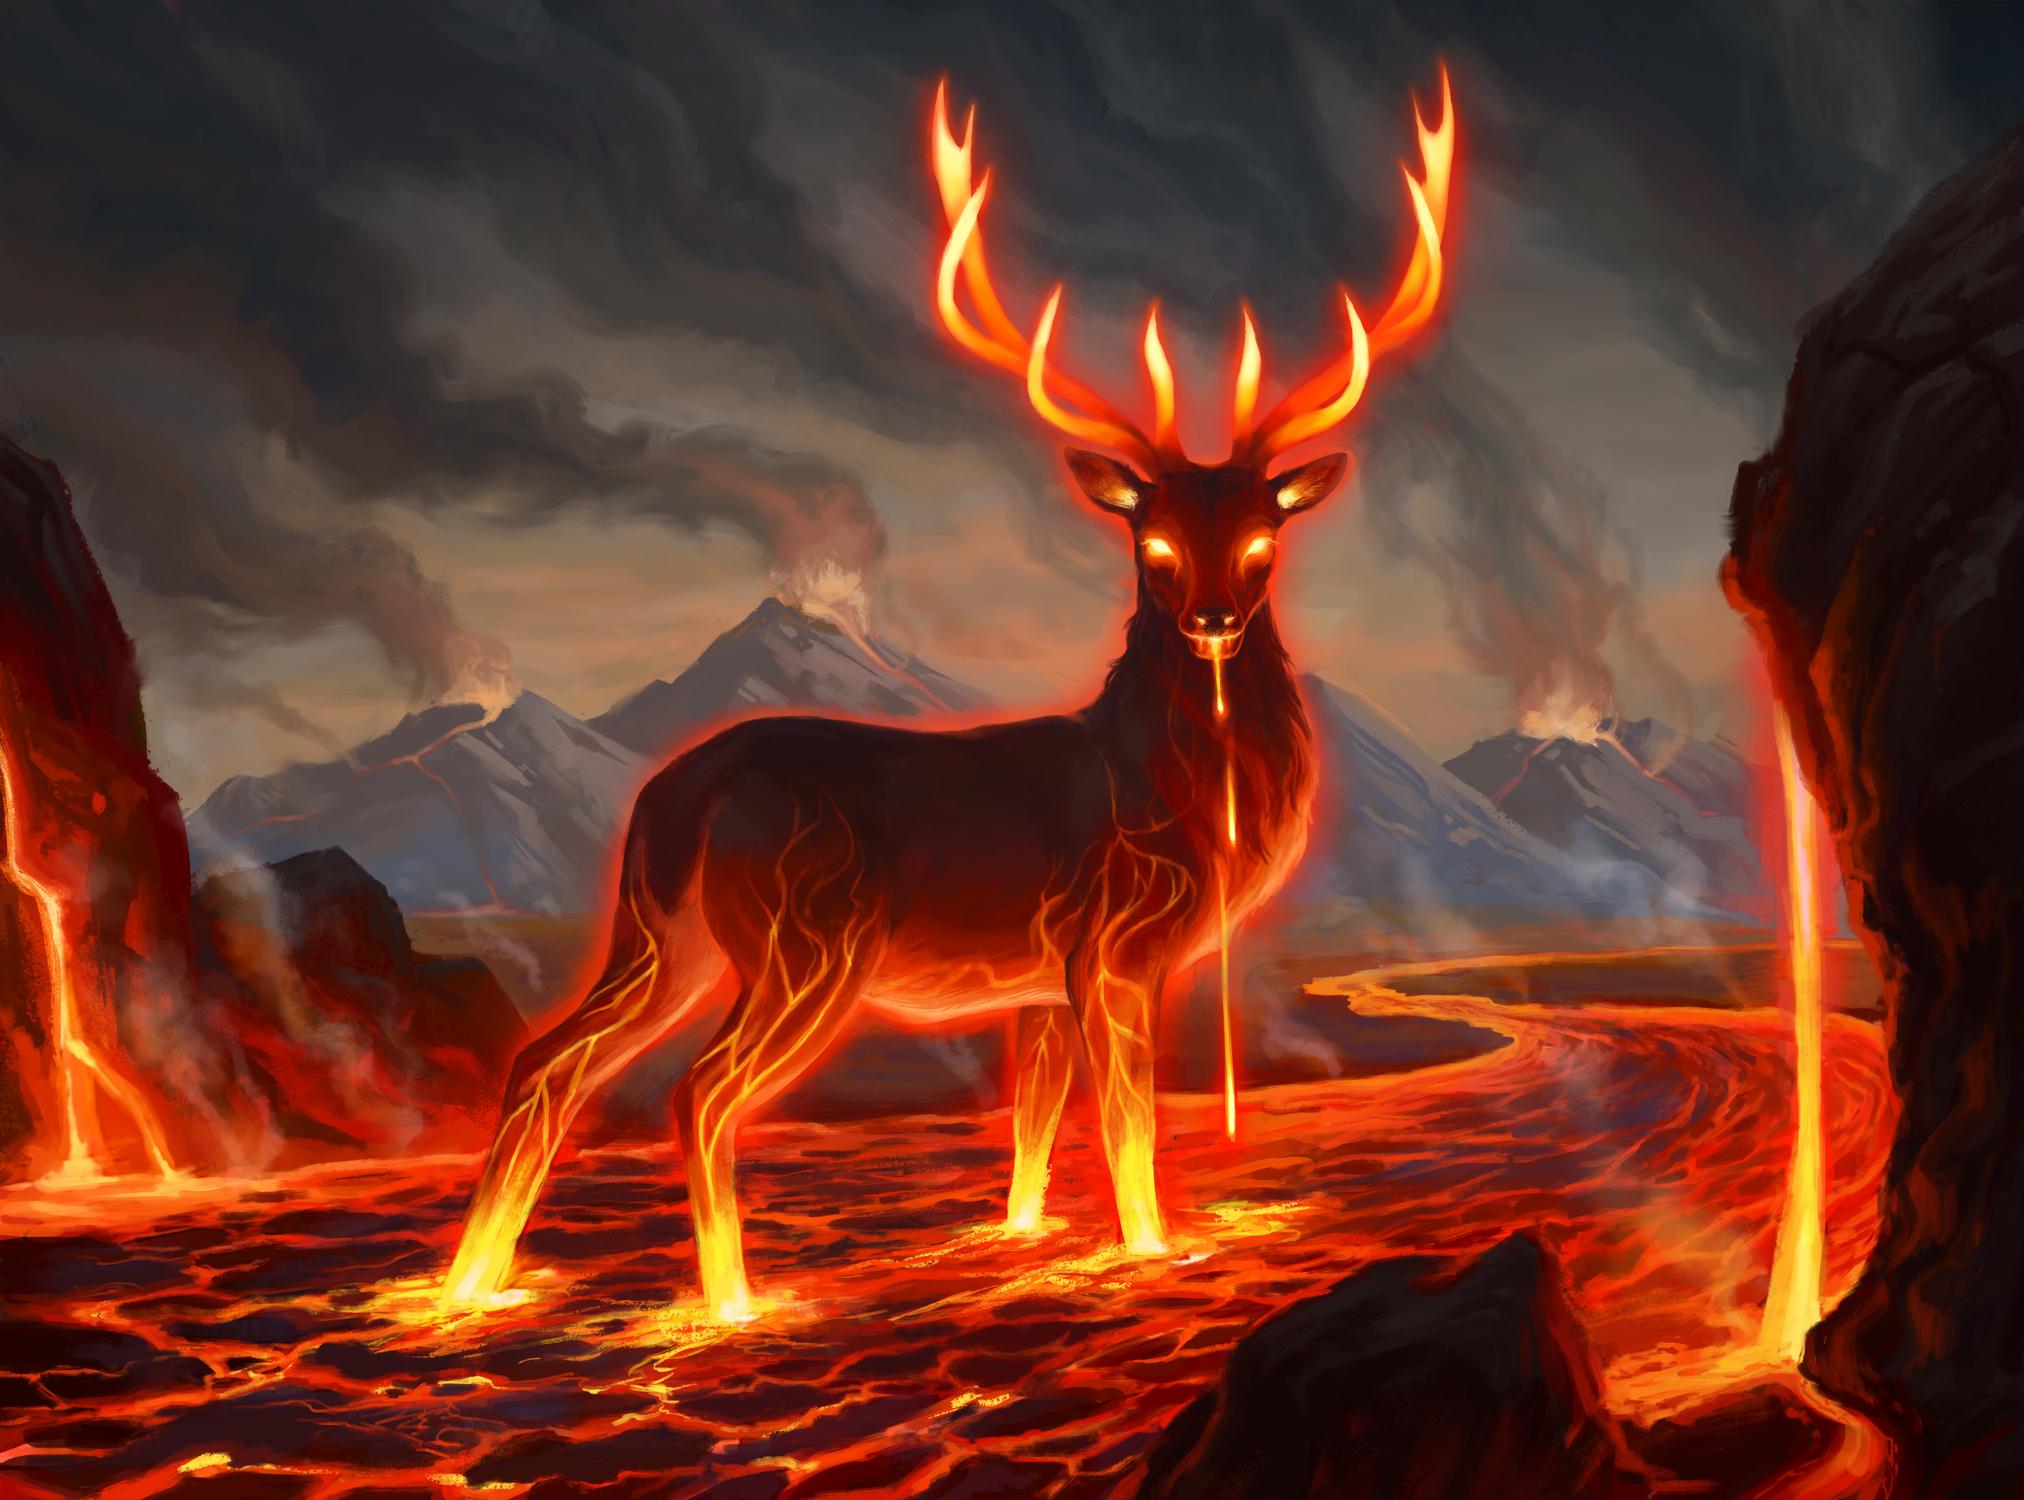 Flame Eater Artwork by Kathleen OHara